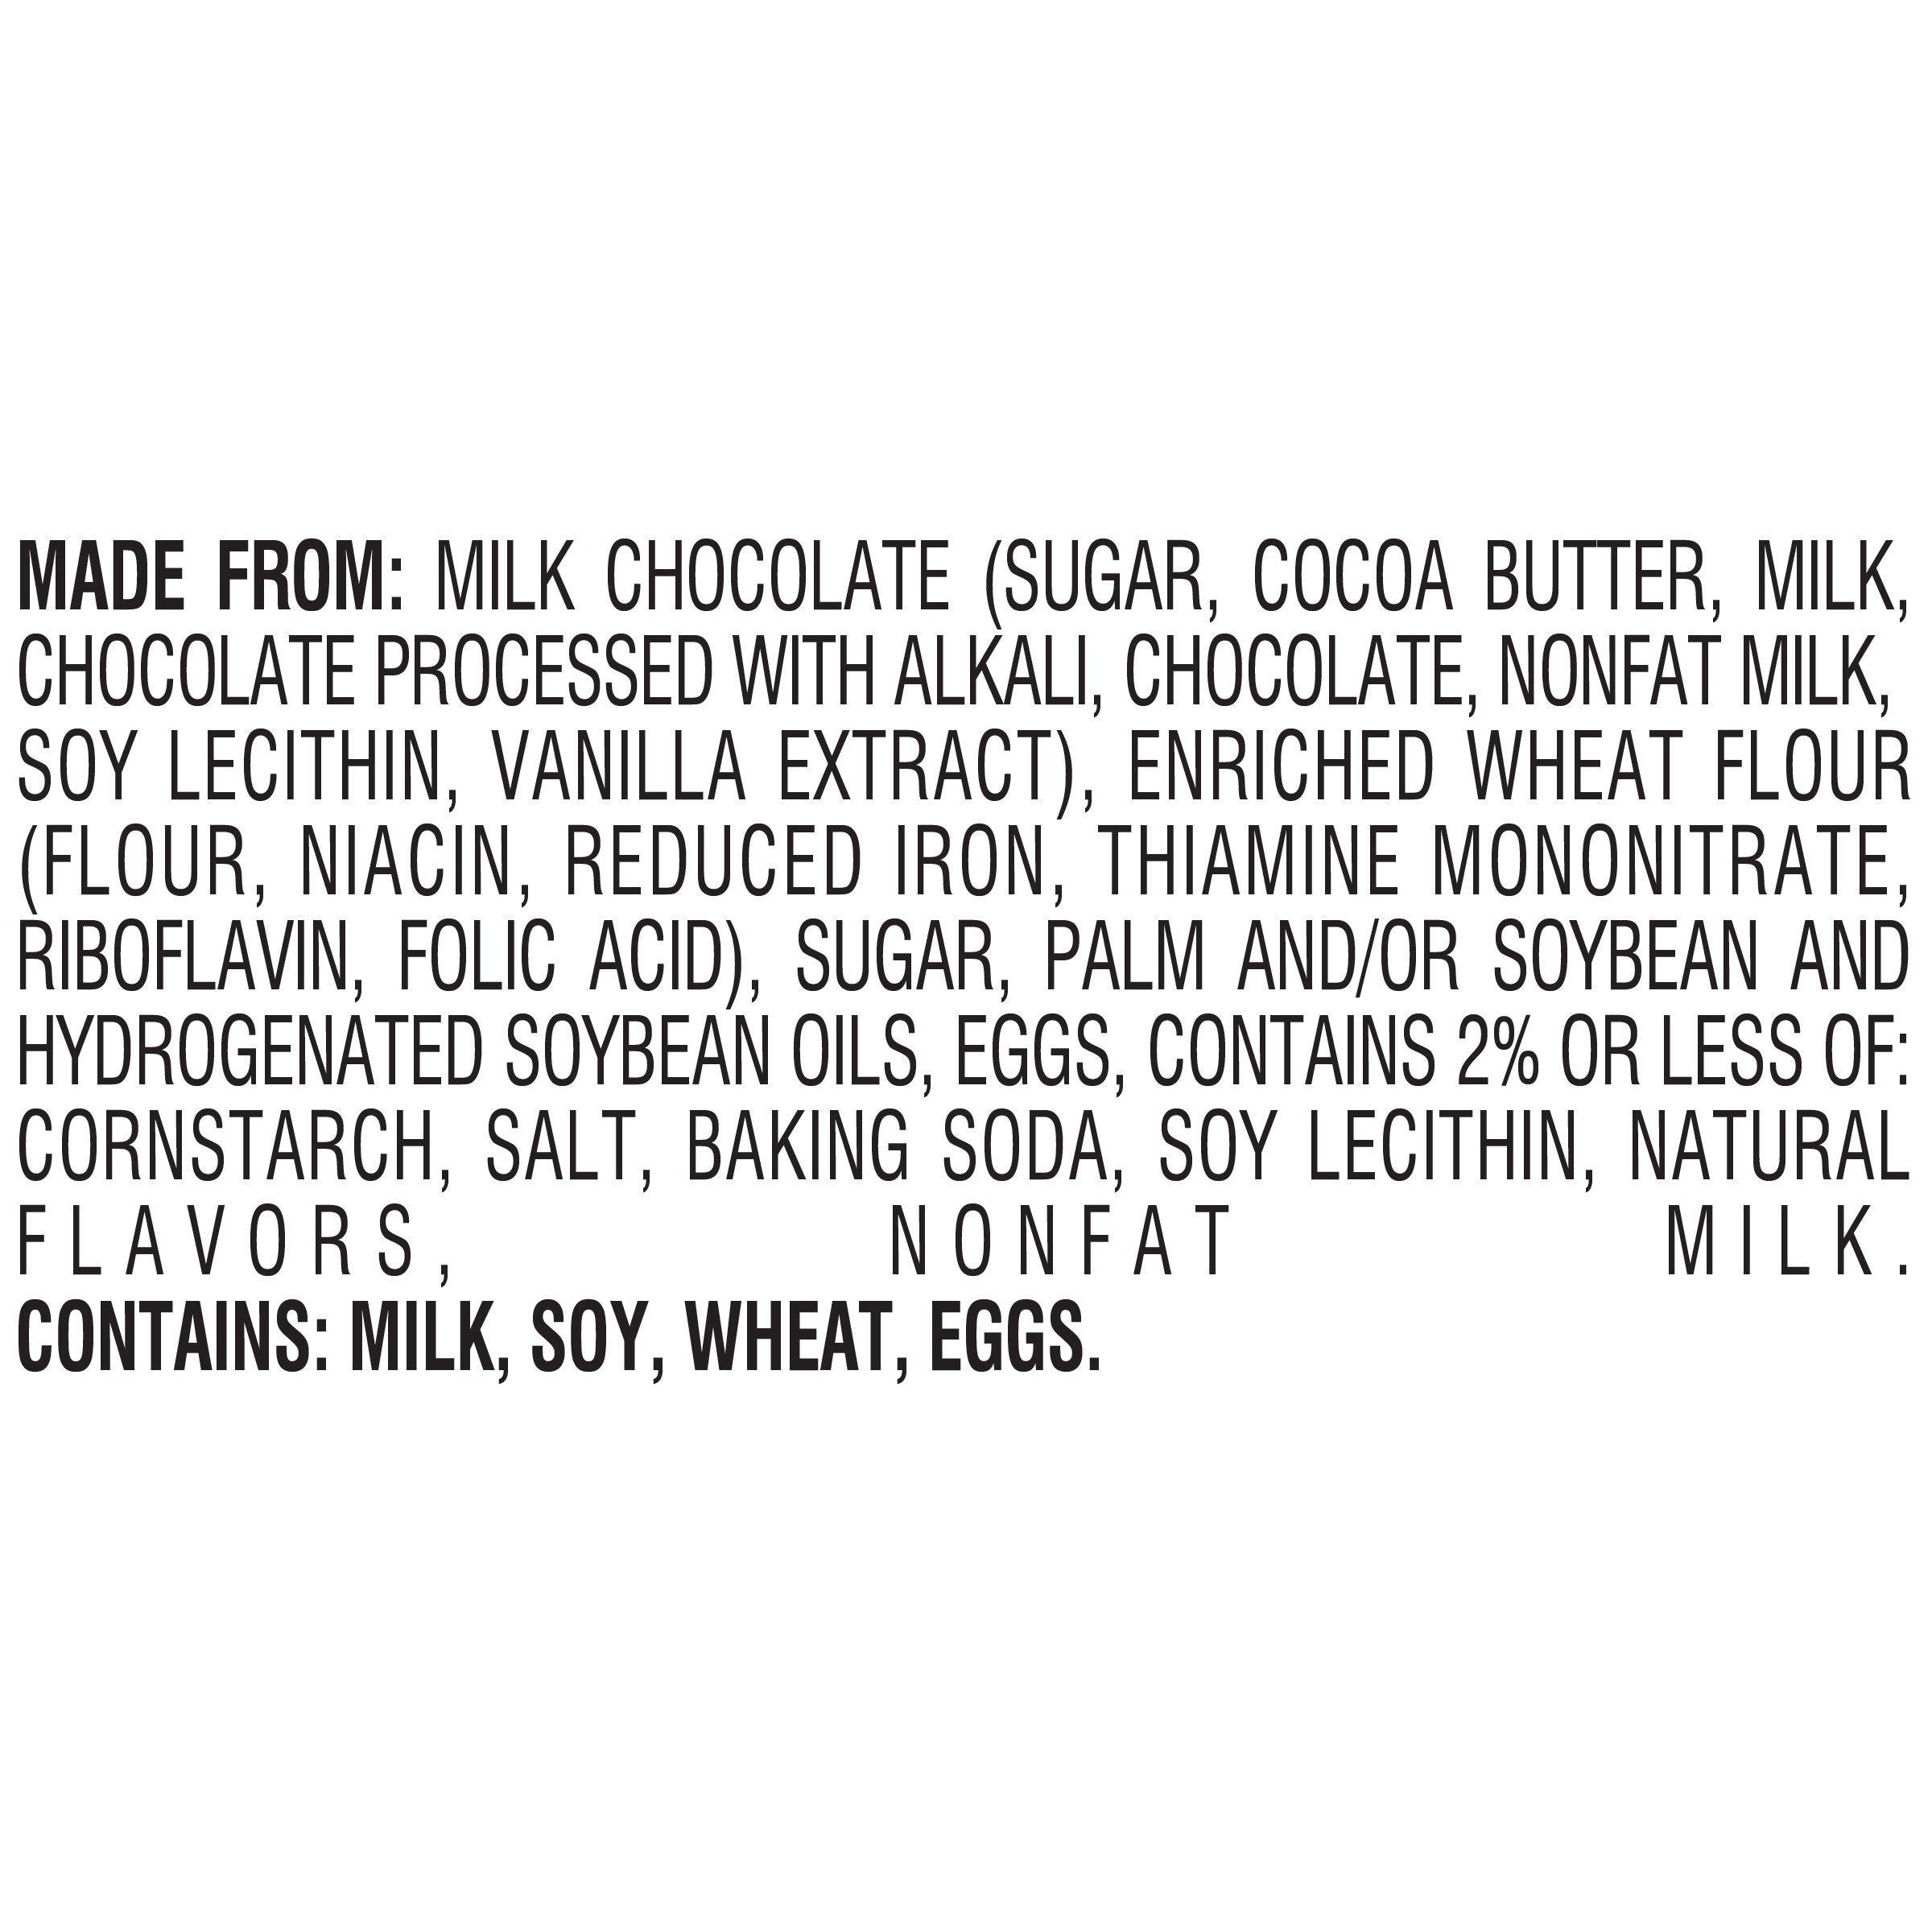 Pepperidge-Farm-Milano-Cookies-Double-Milk-Chocolate-7-5-oz-Bag-3-count thumbnail 3